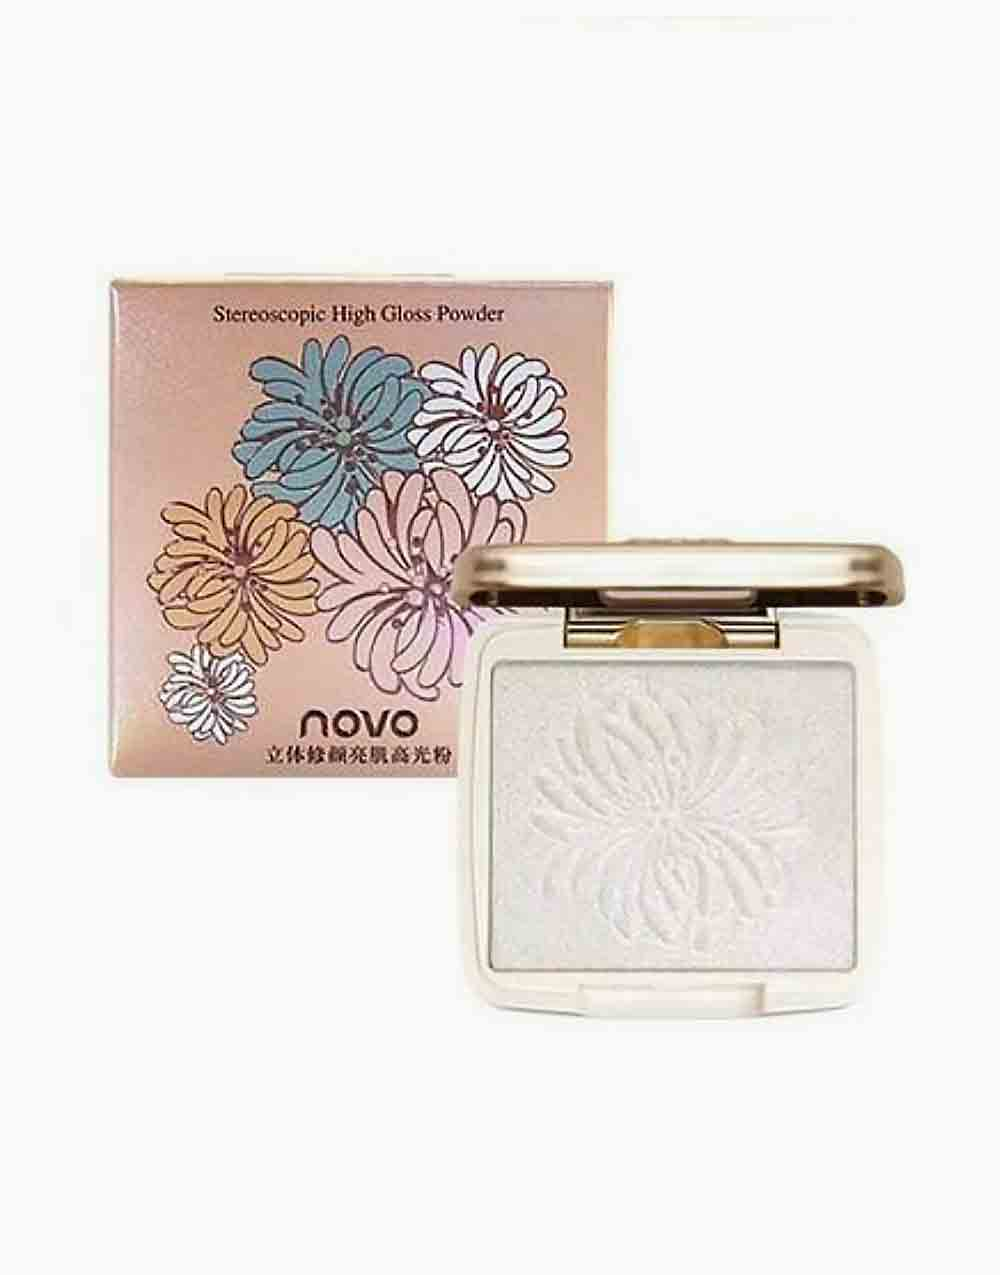 Stereoscopic Highlighter Powder by Novo Cosmetics | #1 Moonlight